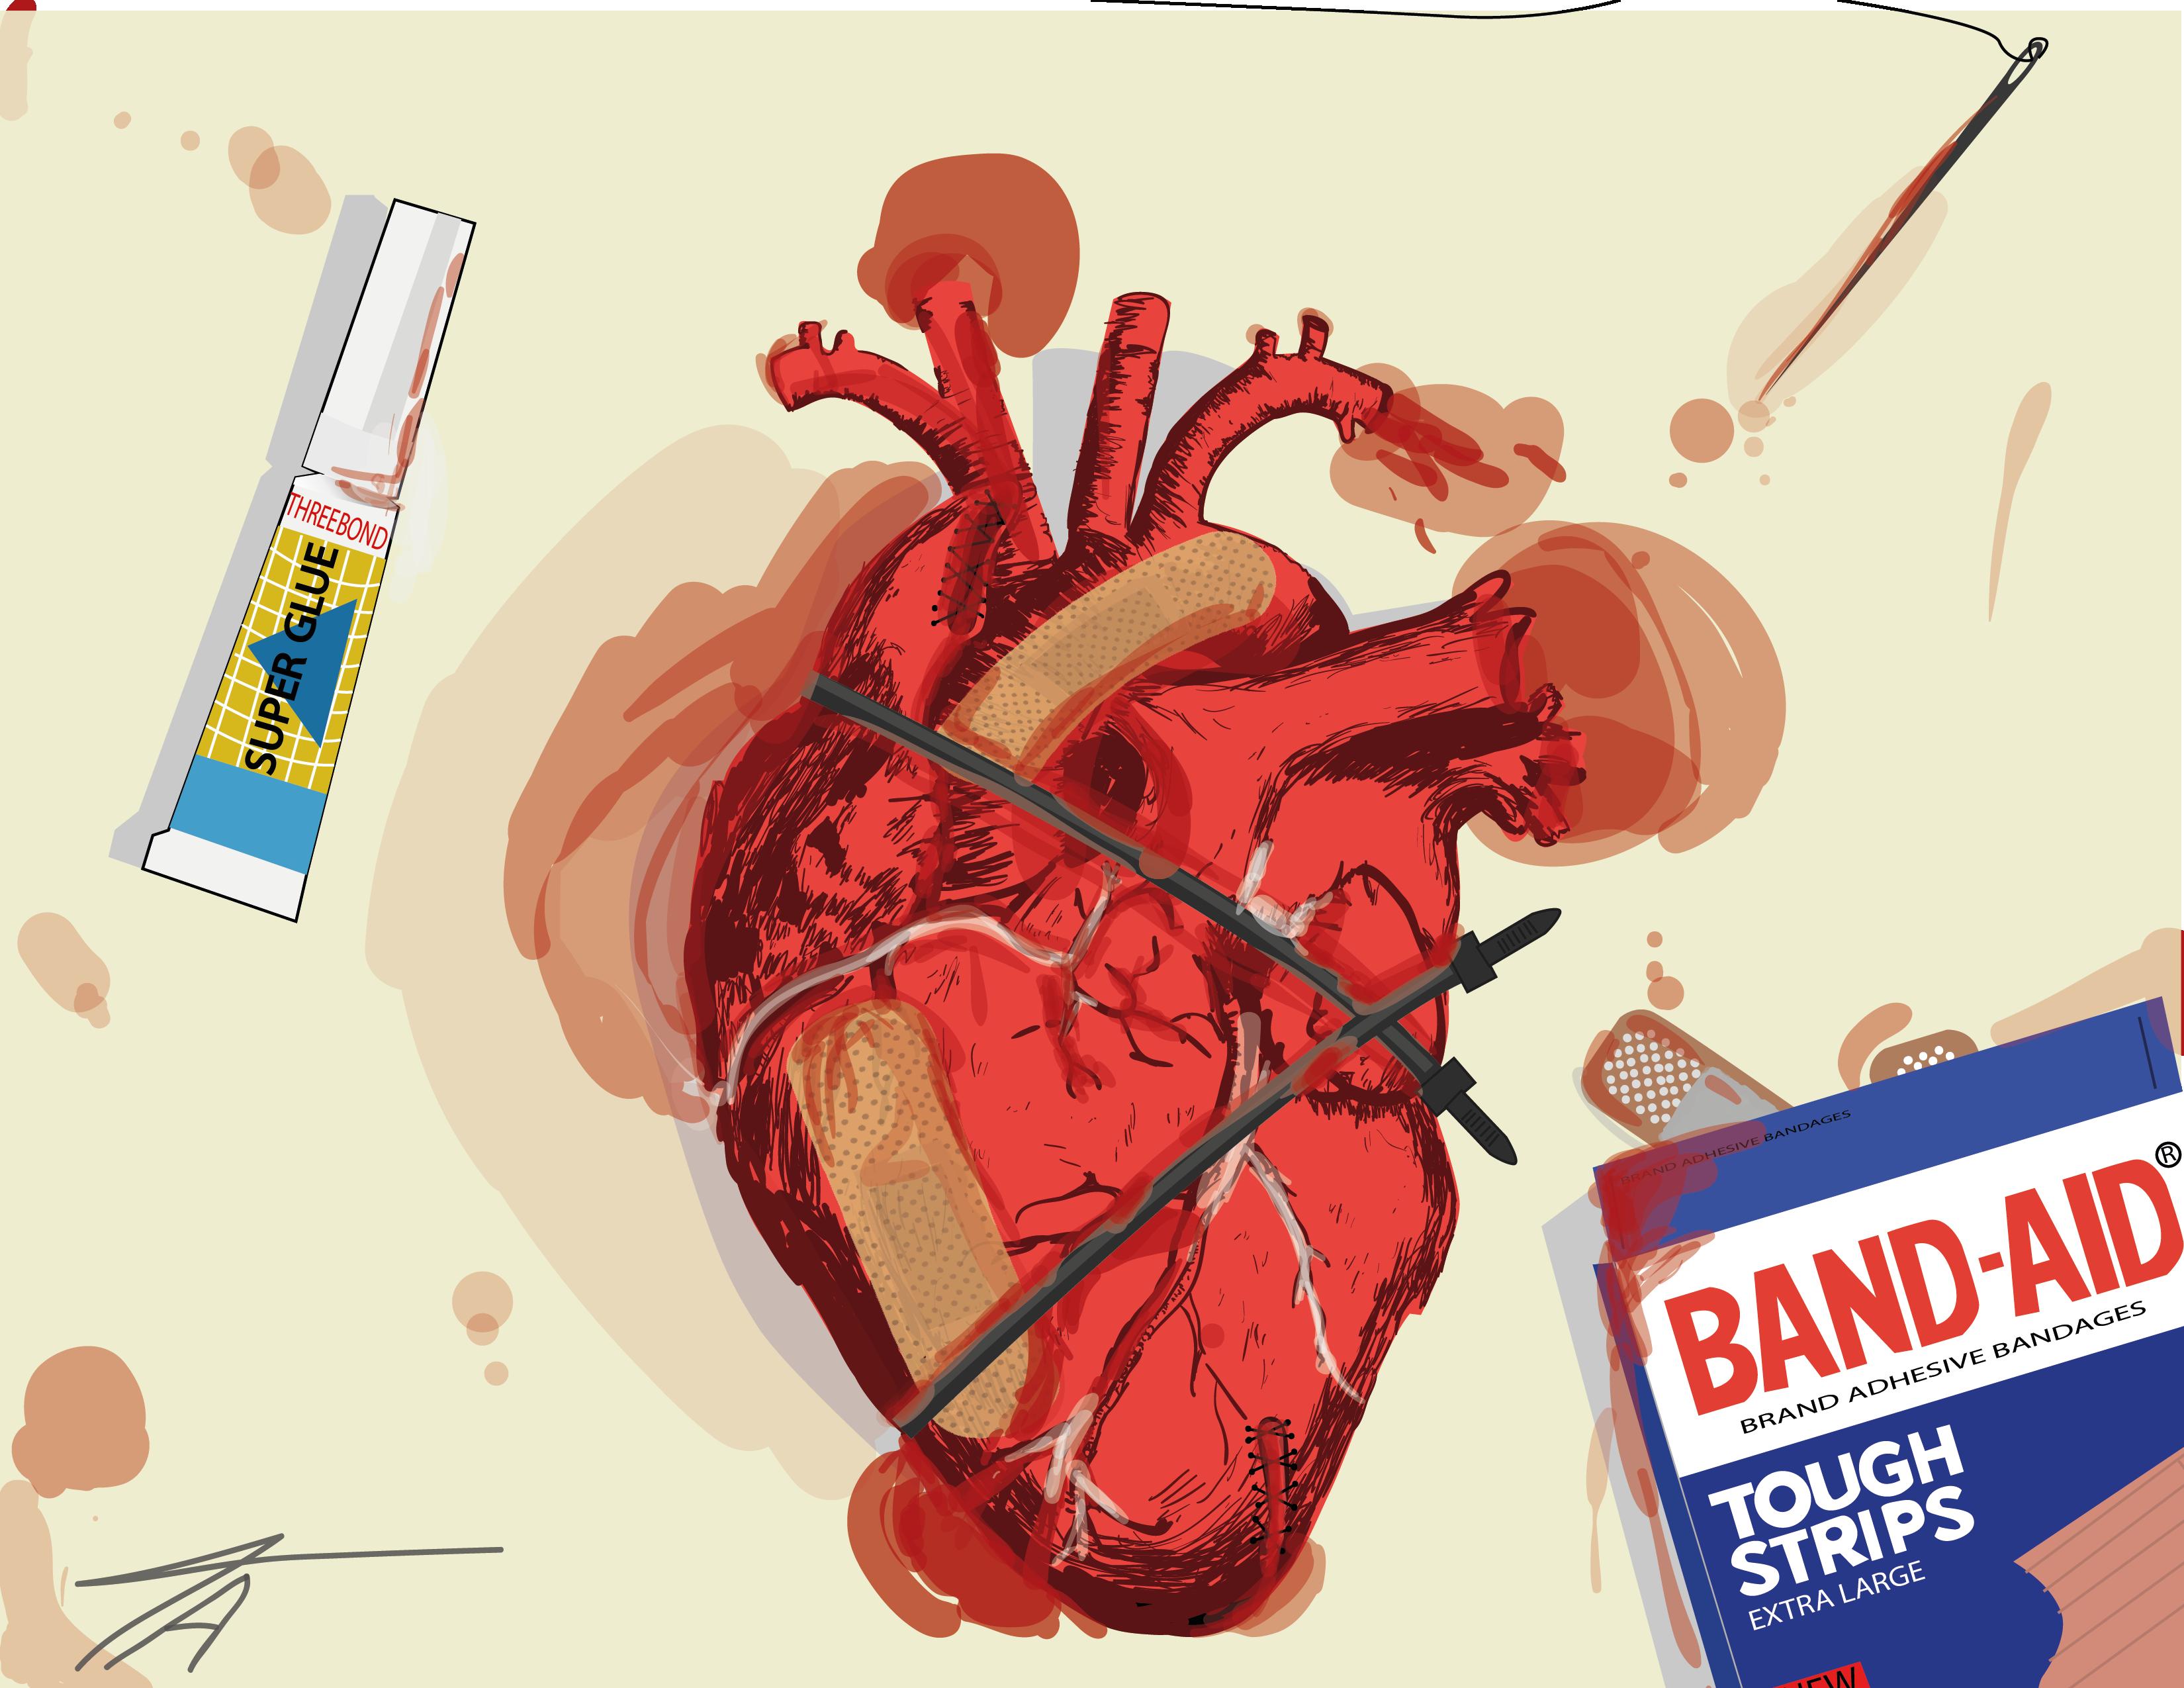 Hintergrundbilder : Illustration, Herz, Karikatur, Comics, Marke ...